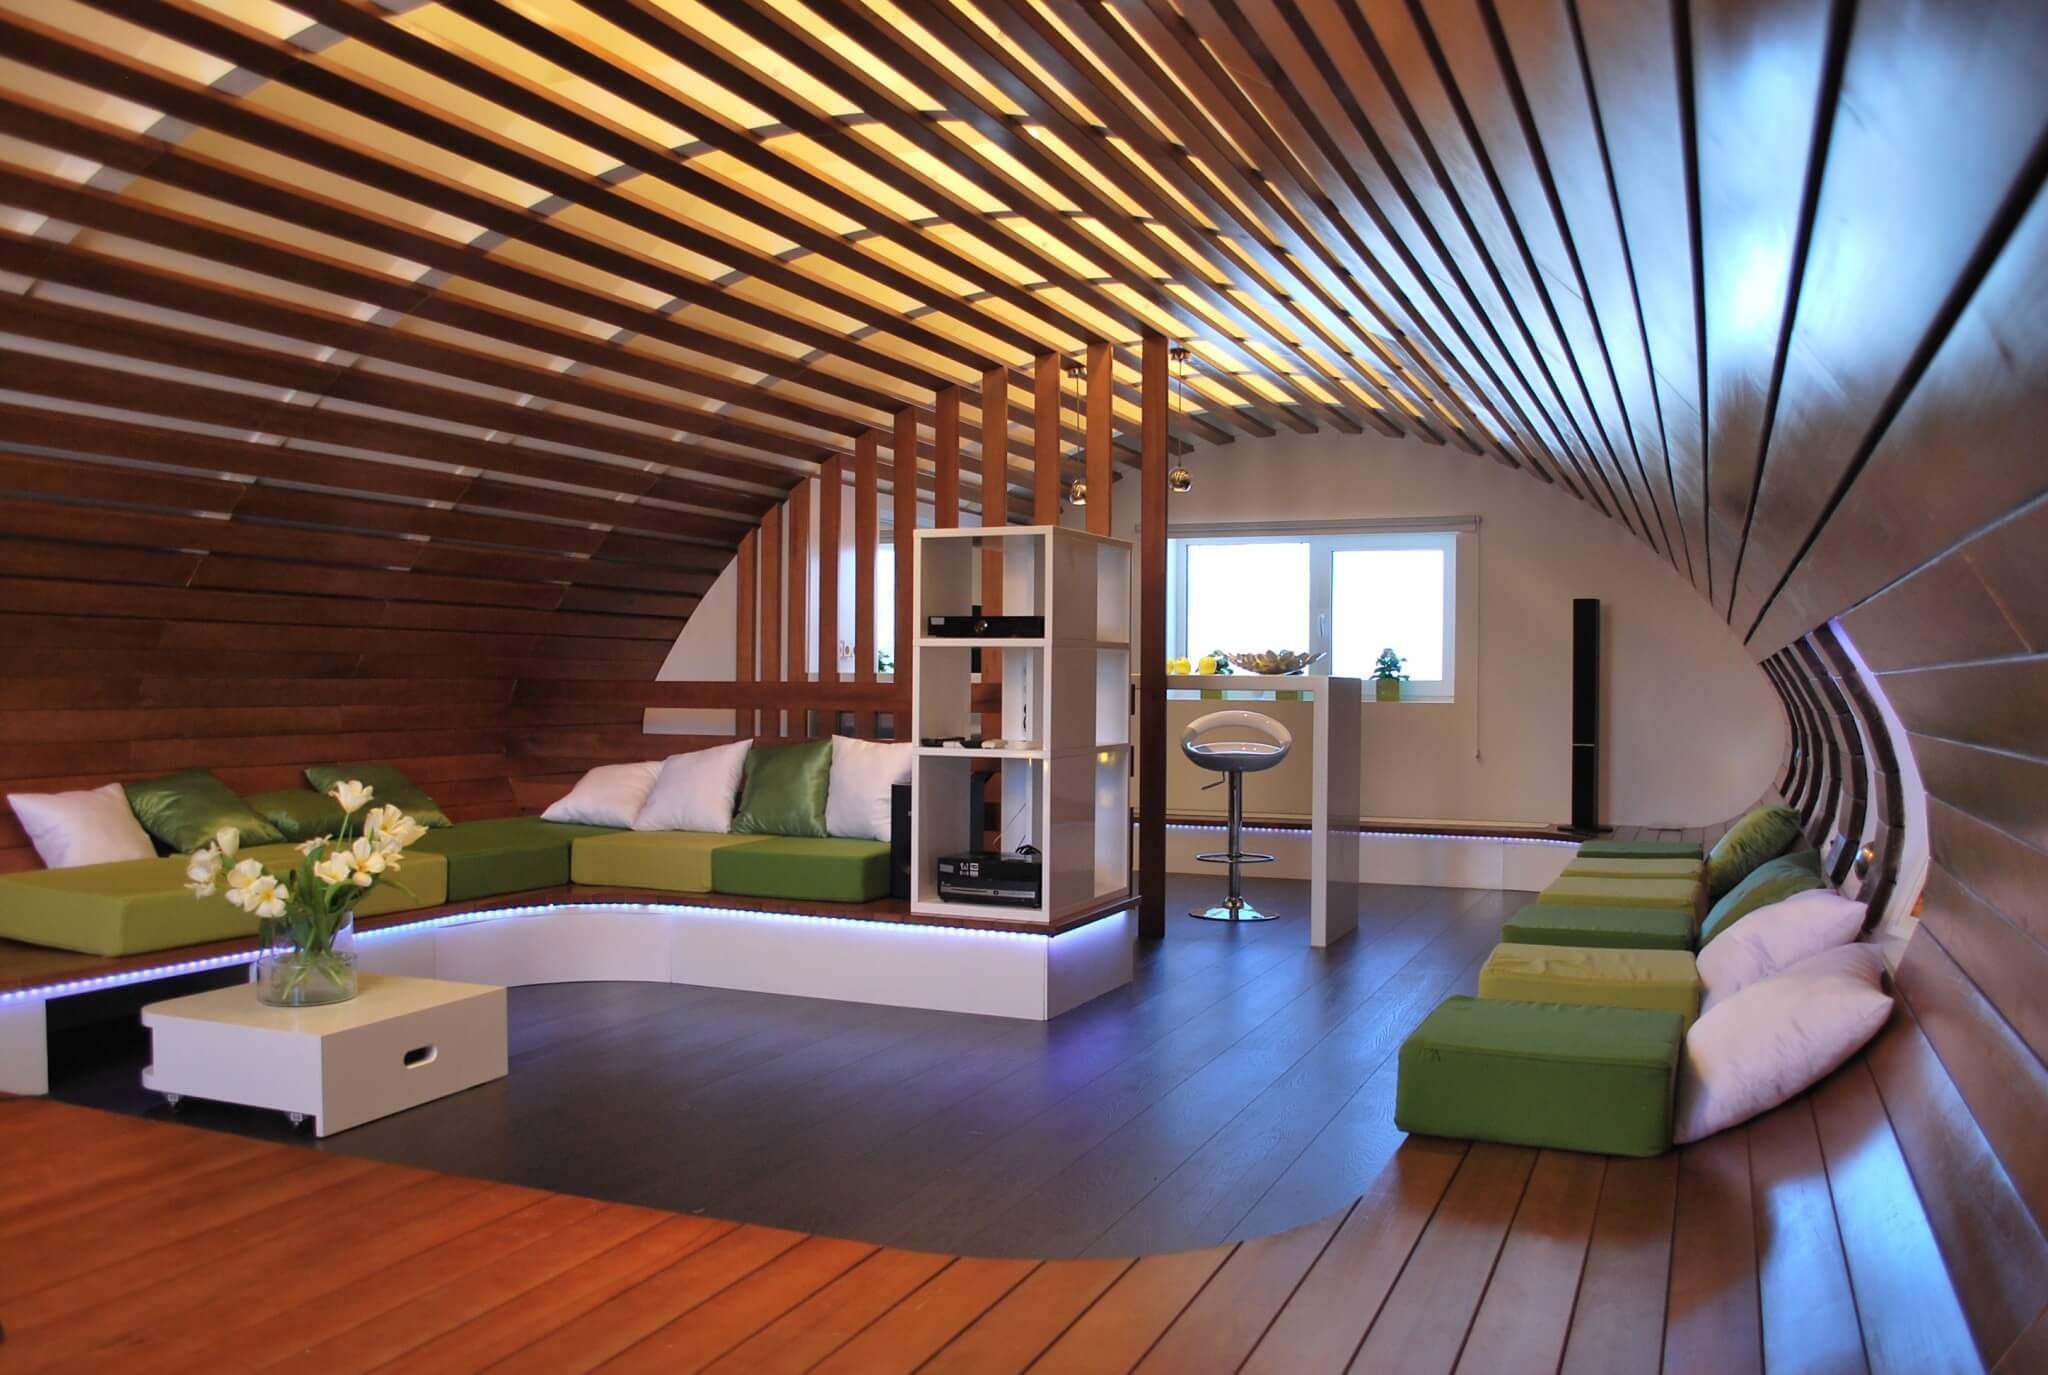 Aluminum Plank (Pinion) Ceiling Construction, Design, Installation. Wooden futuristic round ceiling